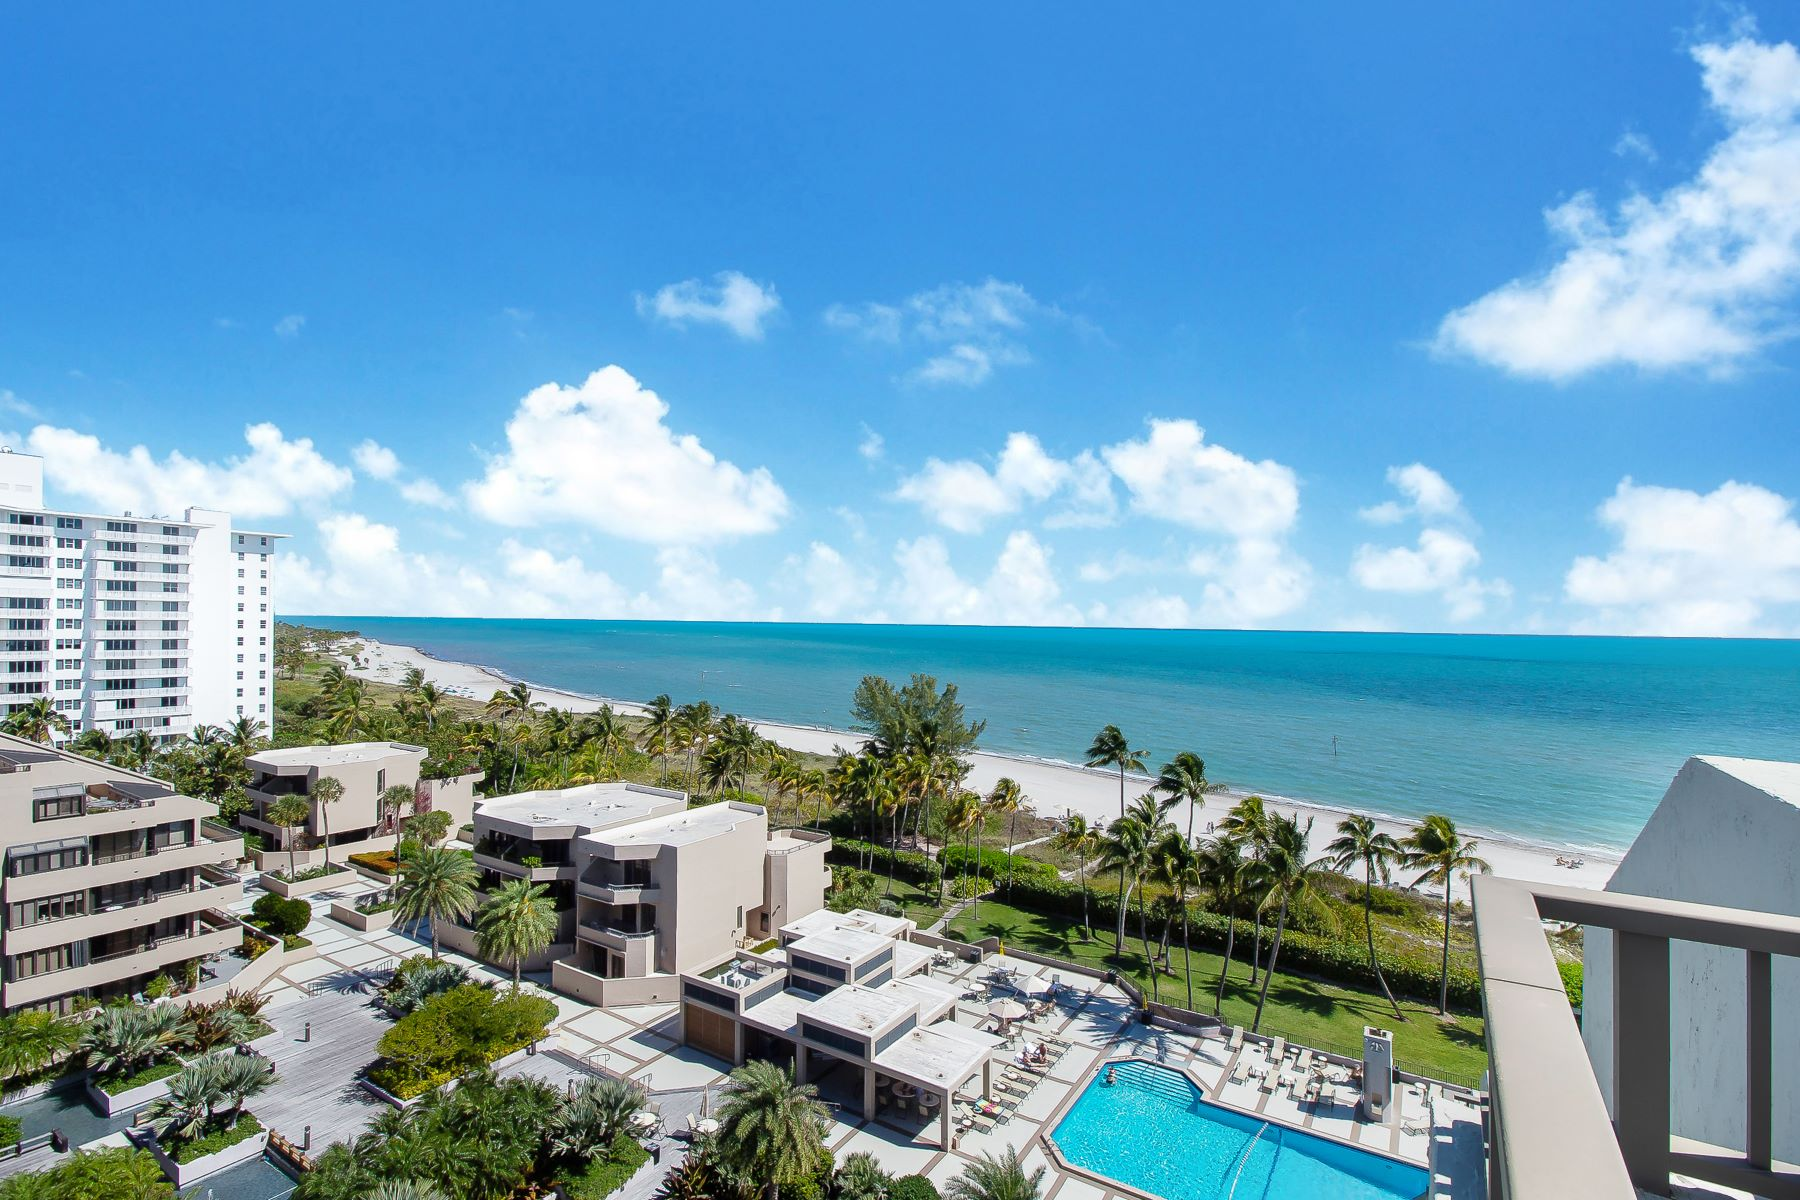 condominiums for Active at 201 Crandon Blvd #938 201 Crandon Blvd 938 Key Biscayne, Florida 33149 United States